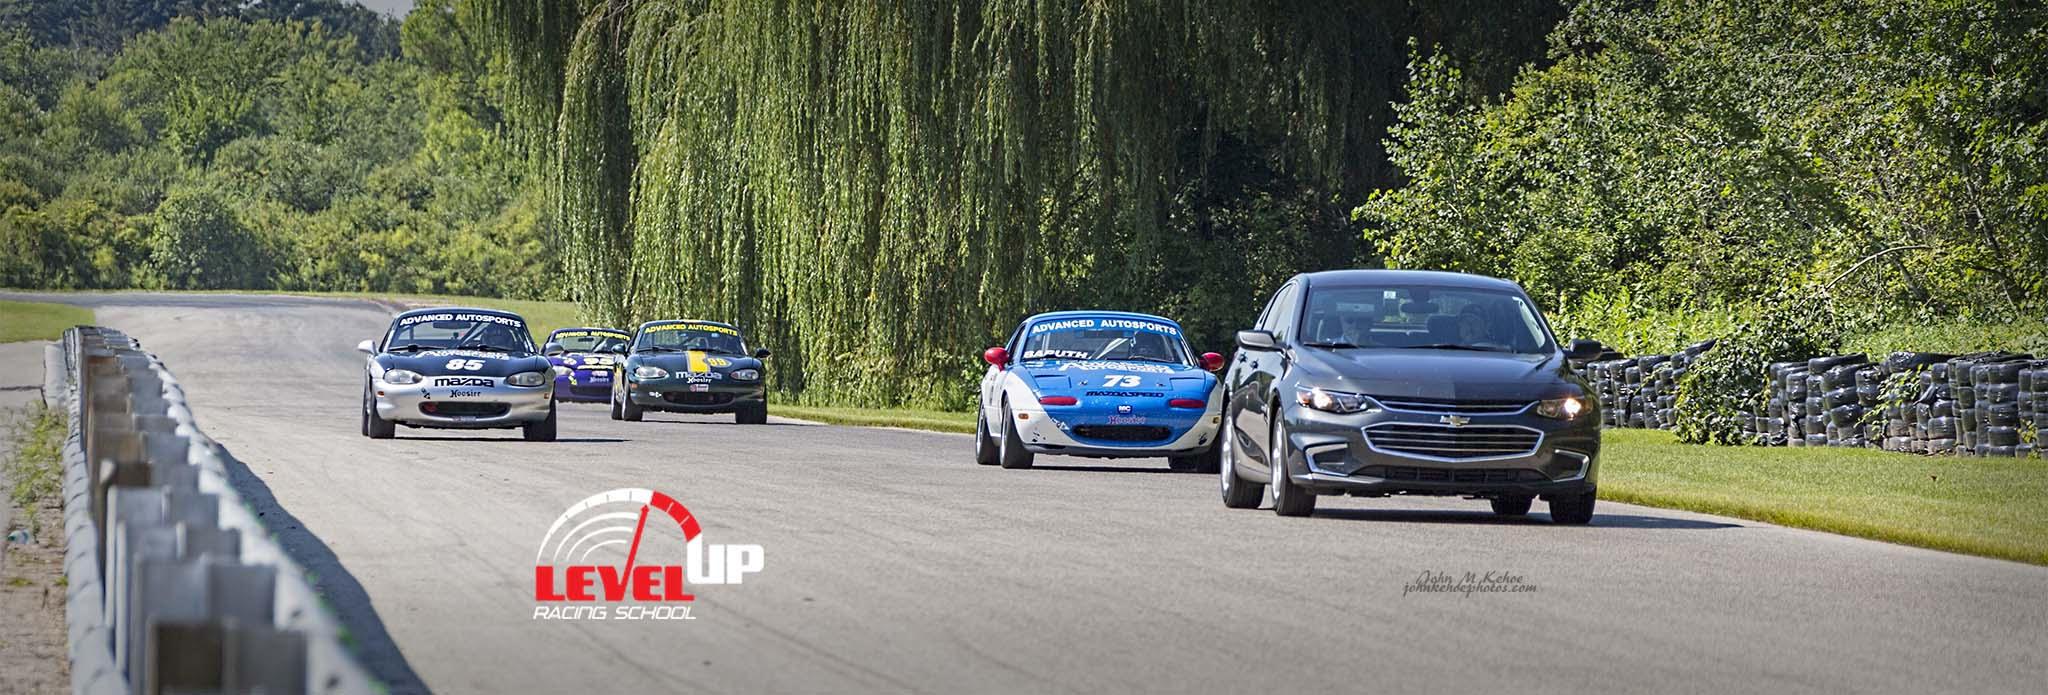 Levelup Racing School Featured On Roadandtrack Com Levelup Racing